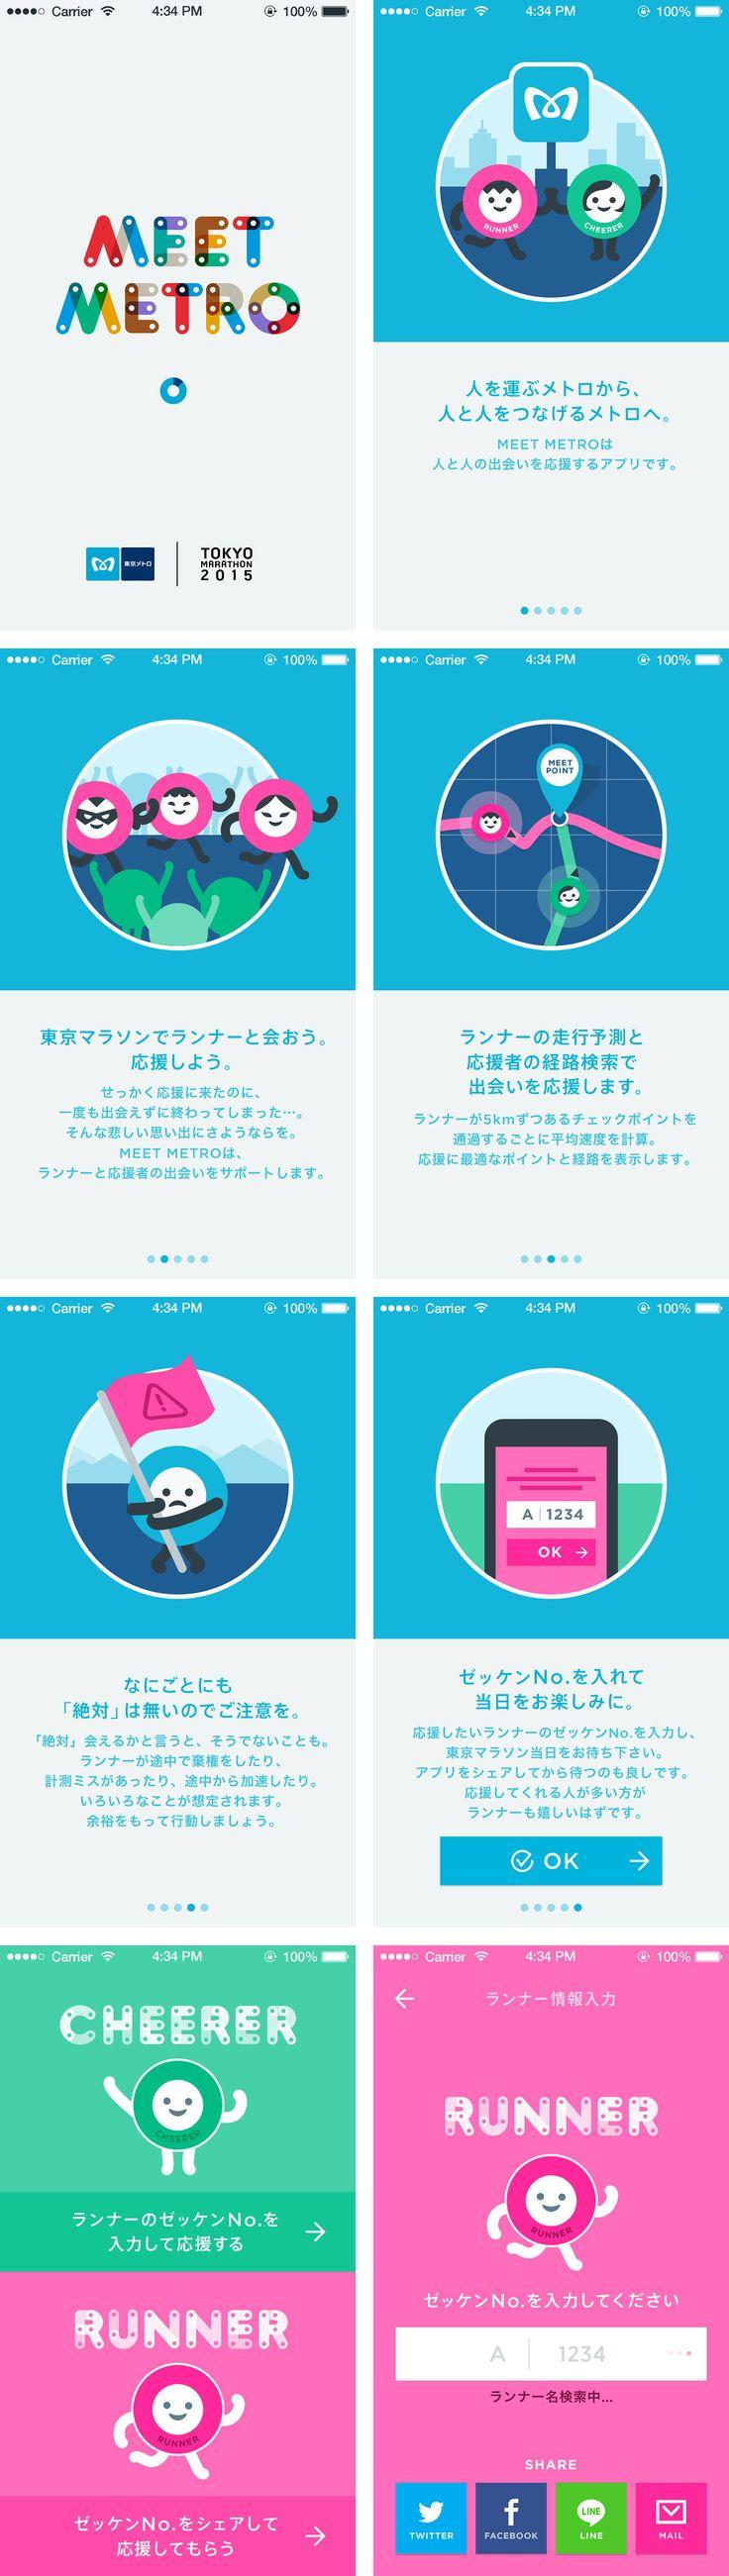 "iOS APP ""MEET METRO"" for Tokyo Marathon 2015.http://meetmetro.jp/"